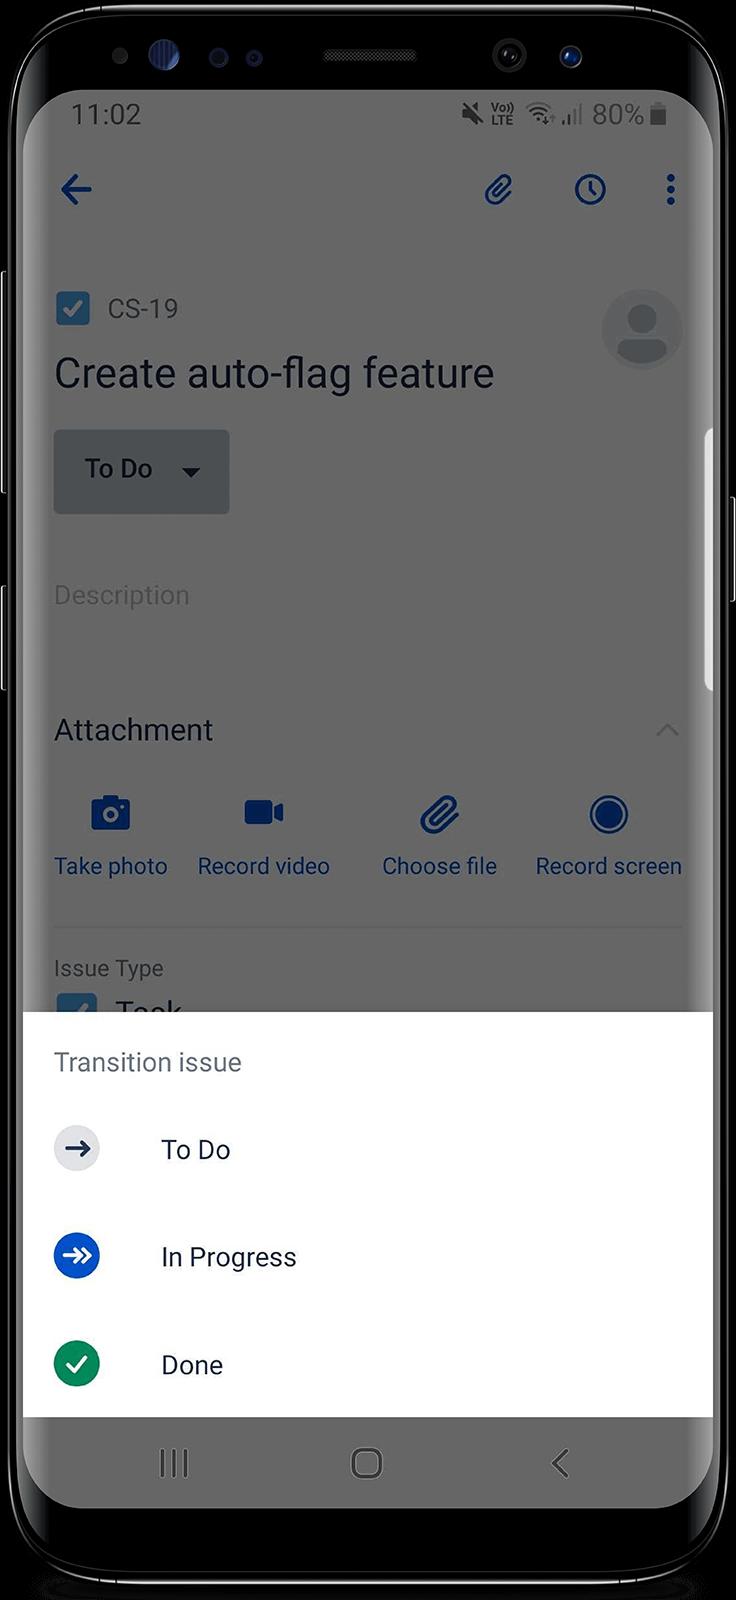 Jira Cloud 모바일 앱에서 펼쳐진 드롭다운